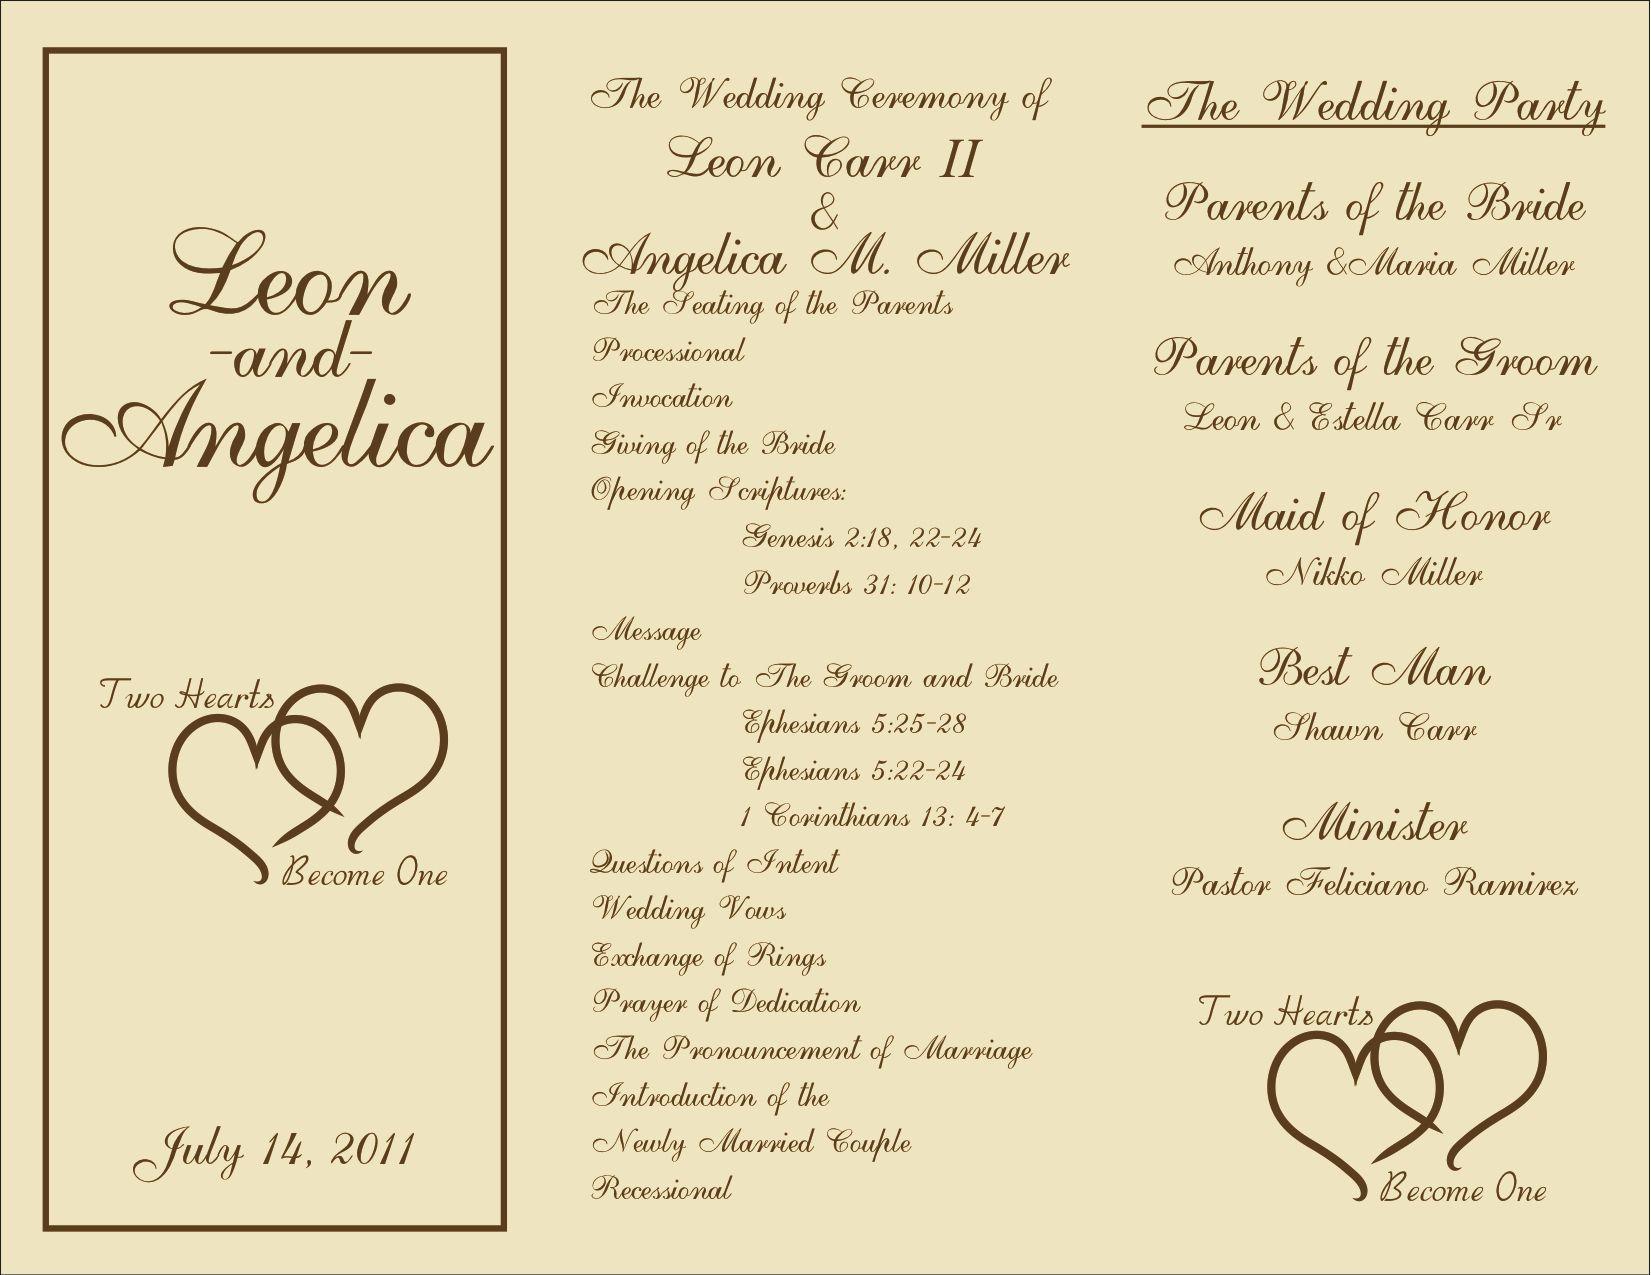 005 Beautiful Template For Wedding Program Idea  Word Free CatholicFull